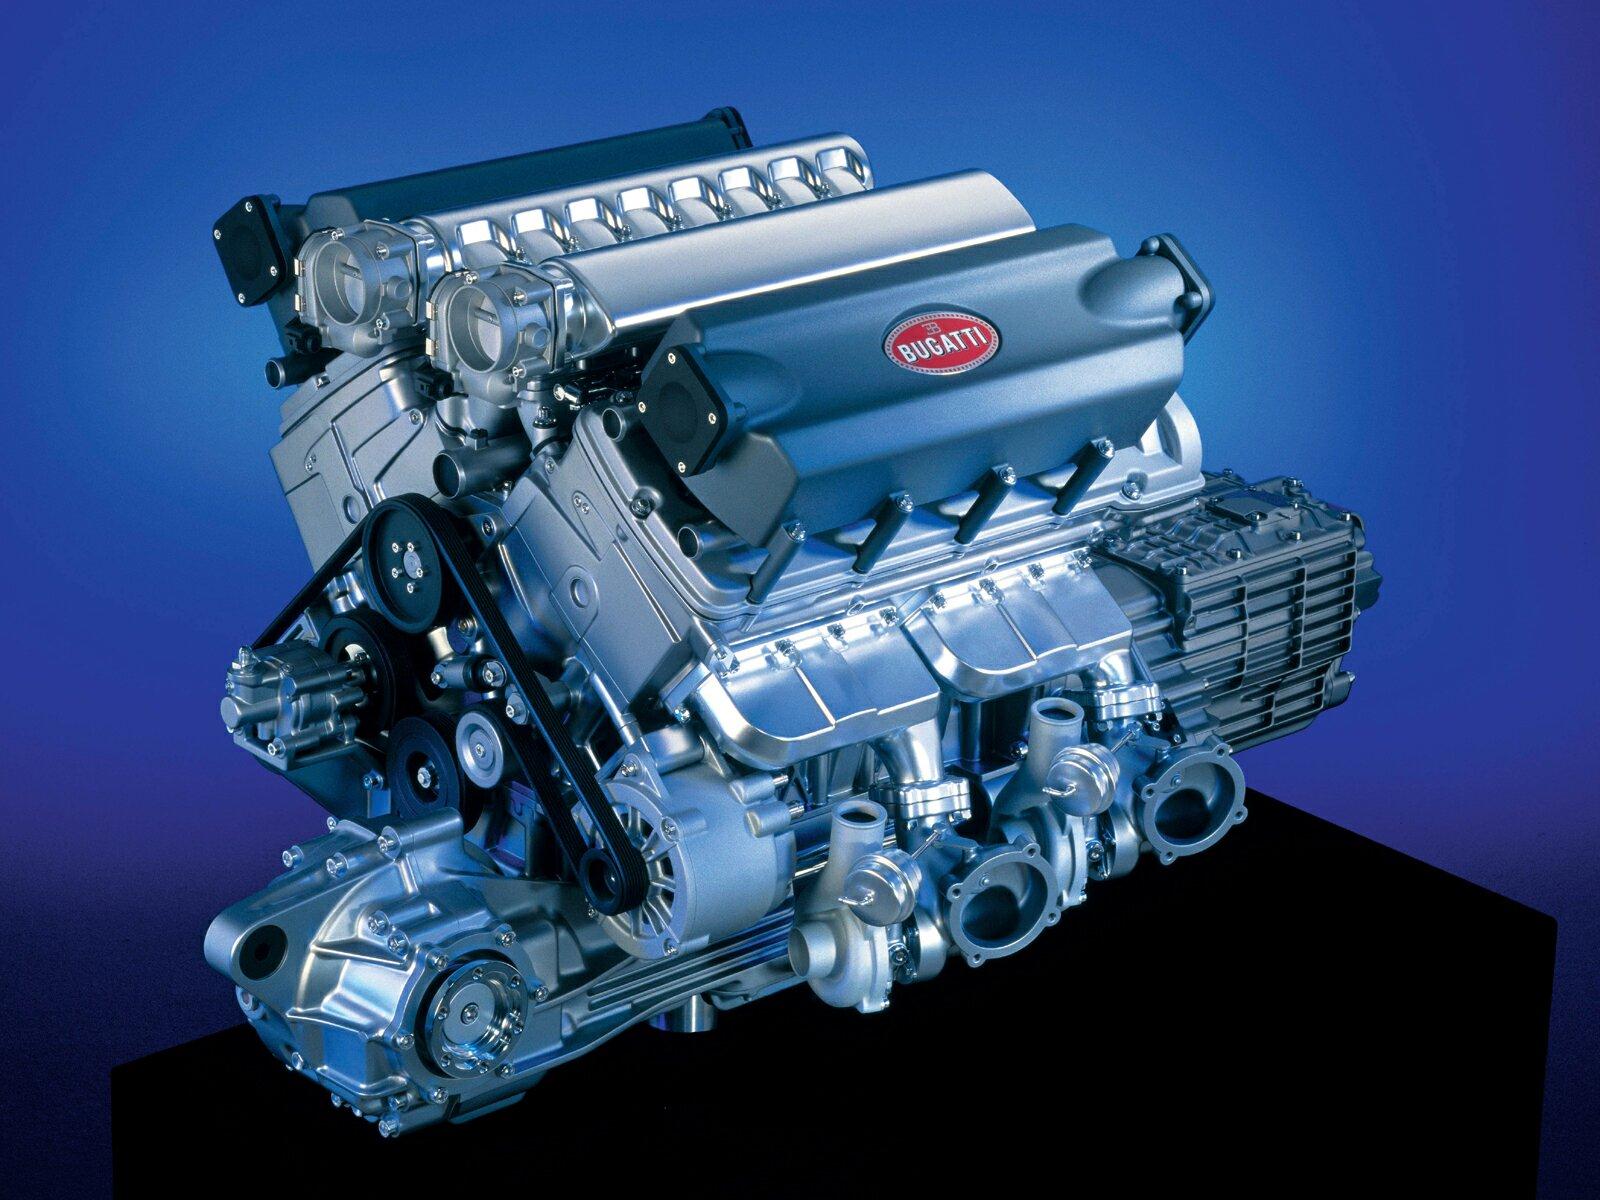 bugatti veyron super engine sport supersport motor fastest w16 sports power el production ever cars specs